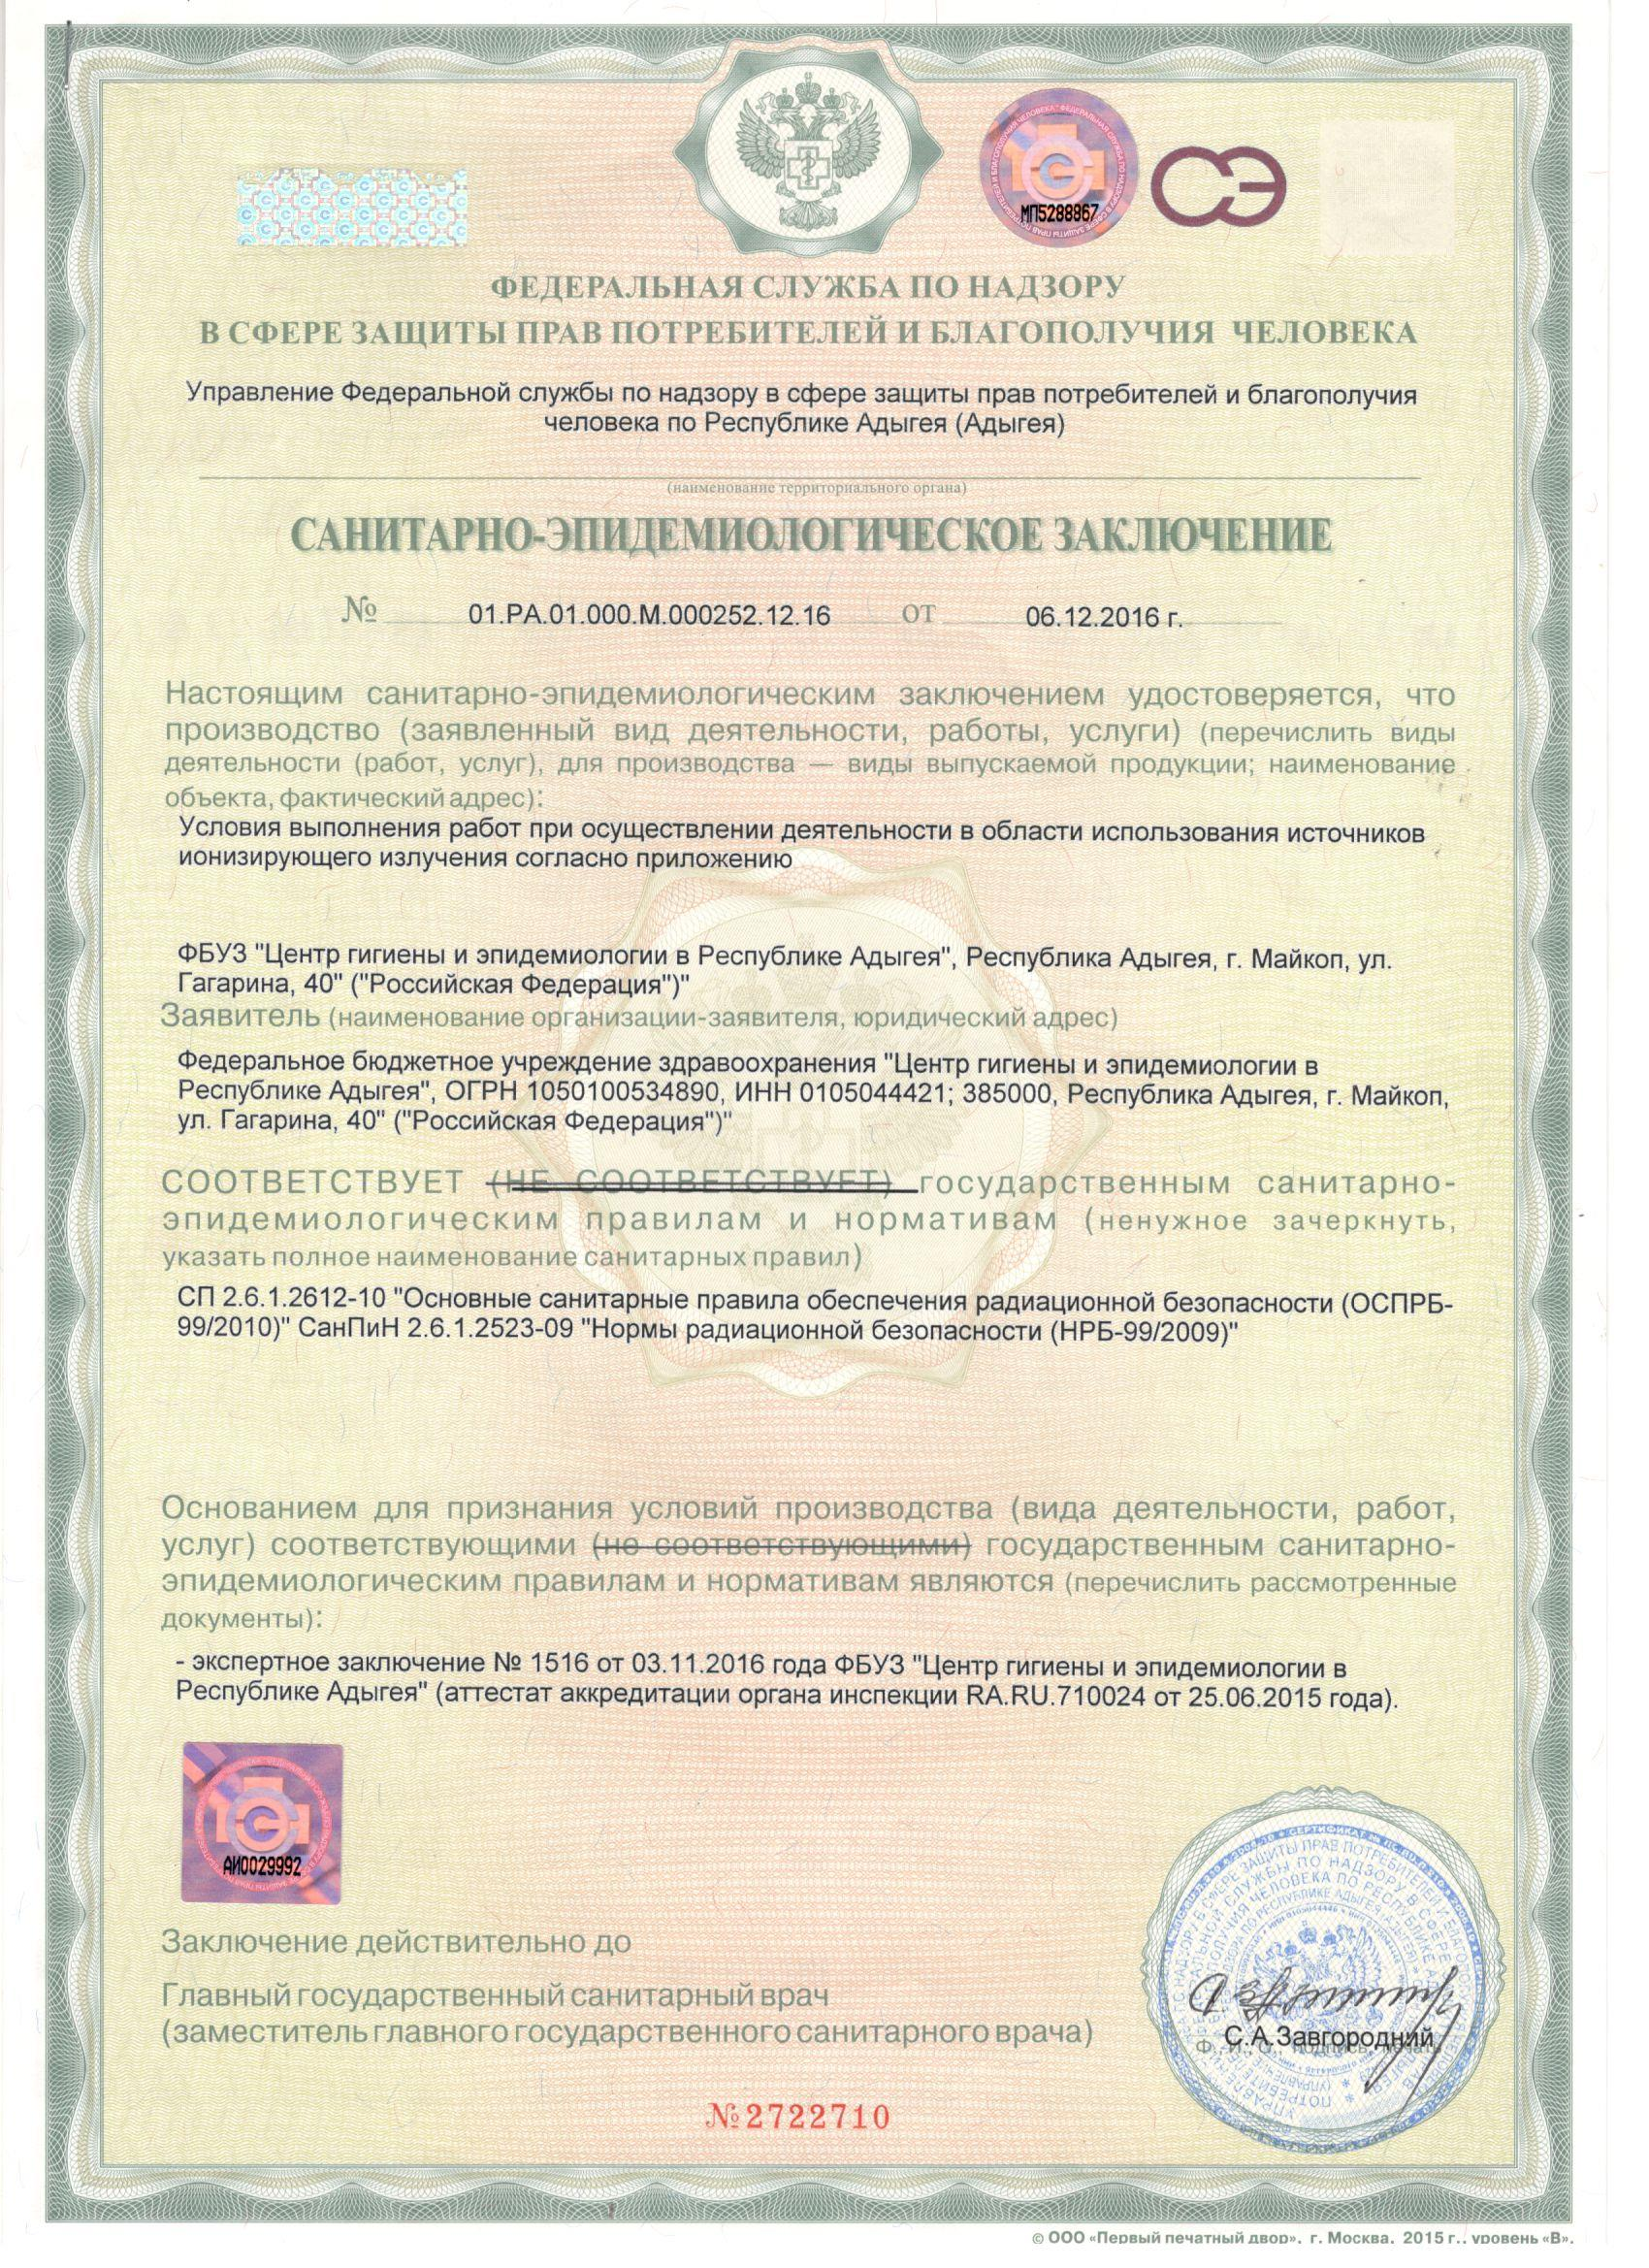 http://fbuz01.rospotrebnadzor.ru/s/218/storage/004_9716.jpg